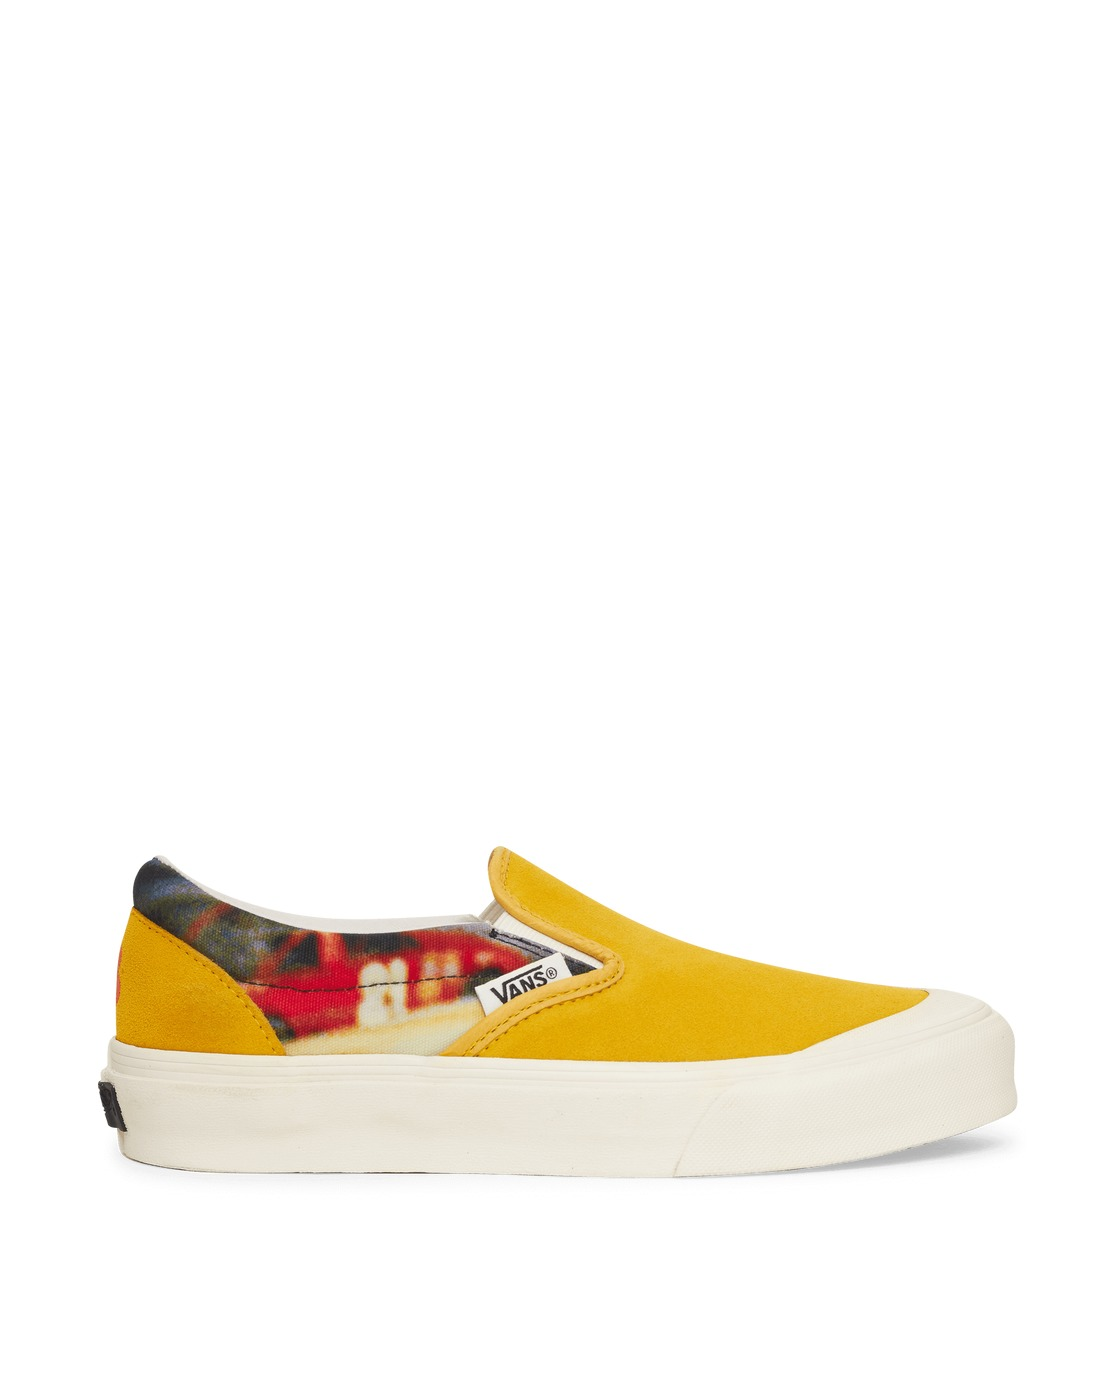 Photo: Vans Slam Jam X Julian Klincewicz Classic Slip On Lx Sneakers Yellow